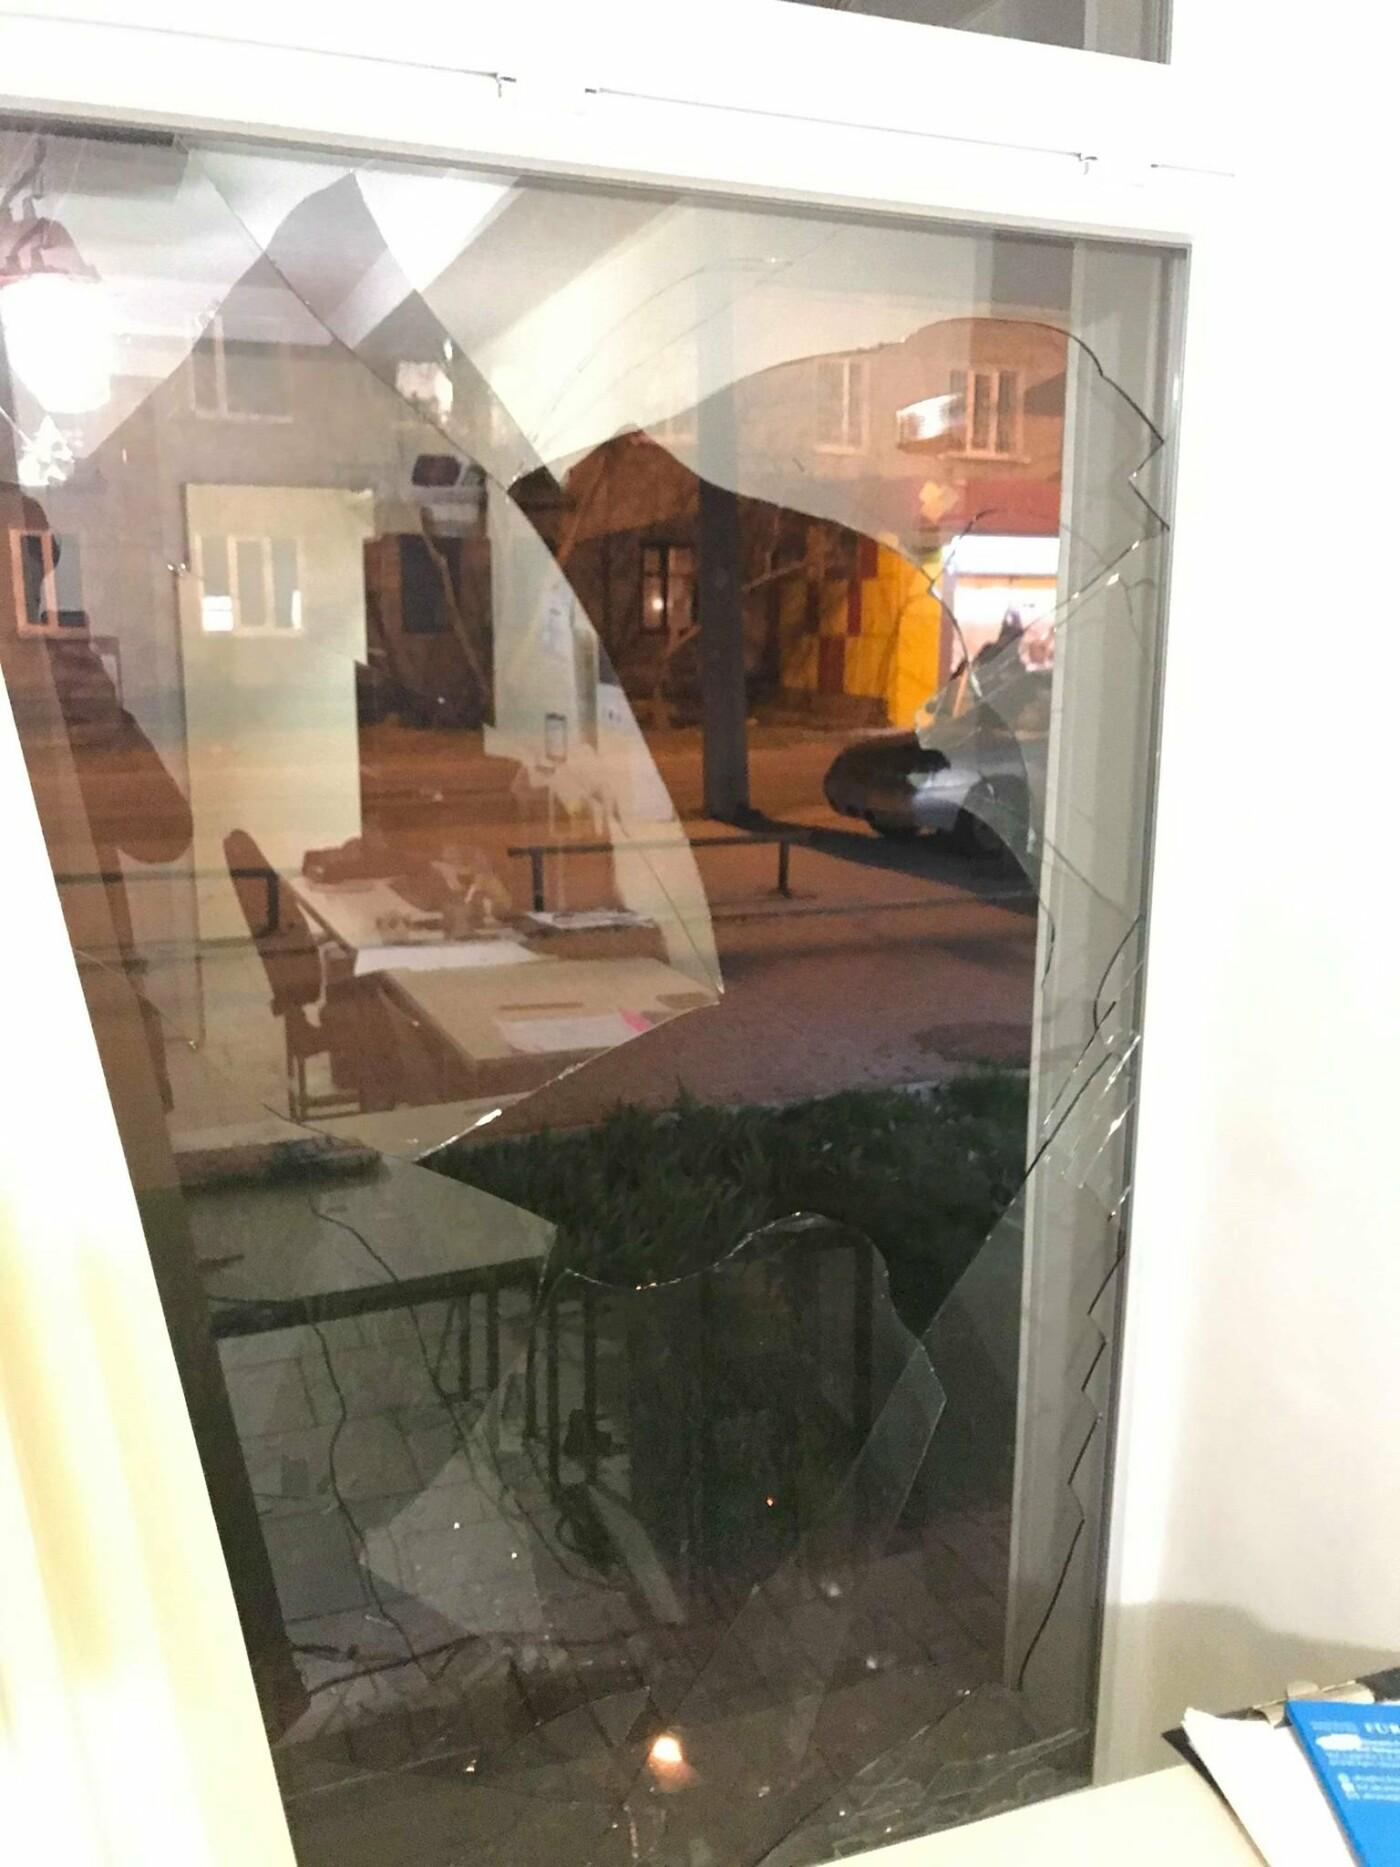 Дружковка: В «Халве» сегодня установили новый стеклопакет взамен разбитого (ФОТО), фото-4